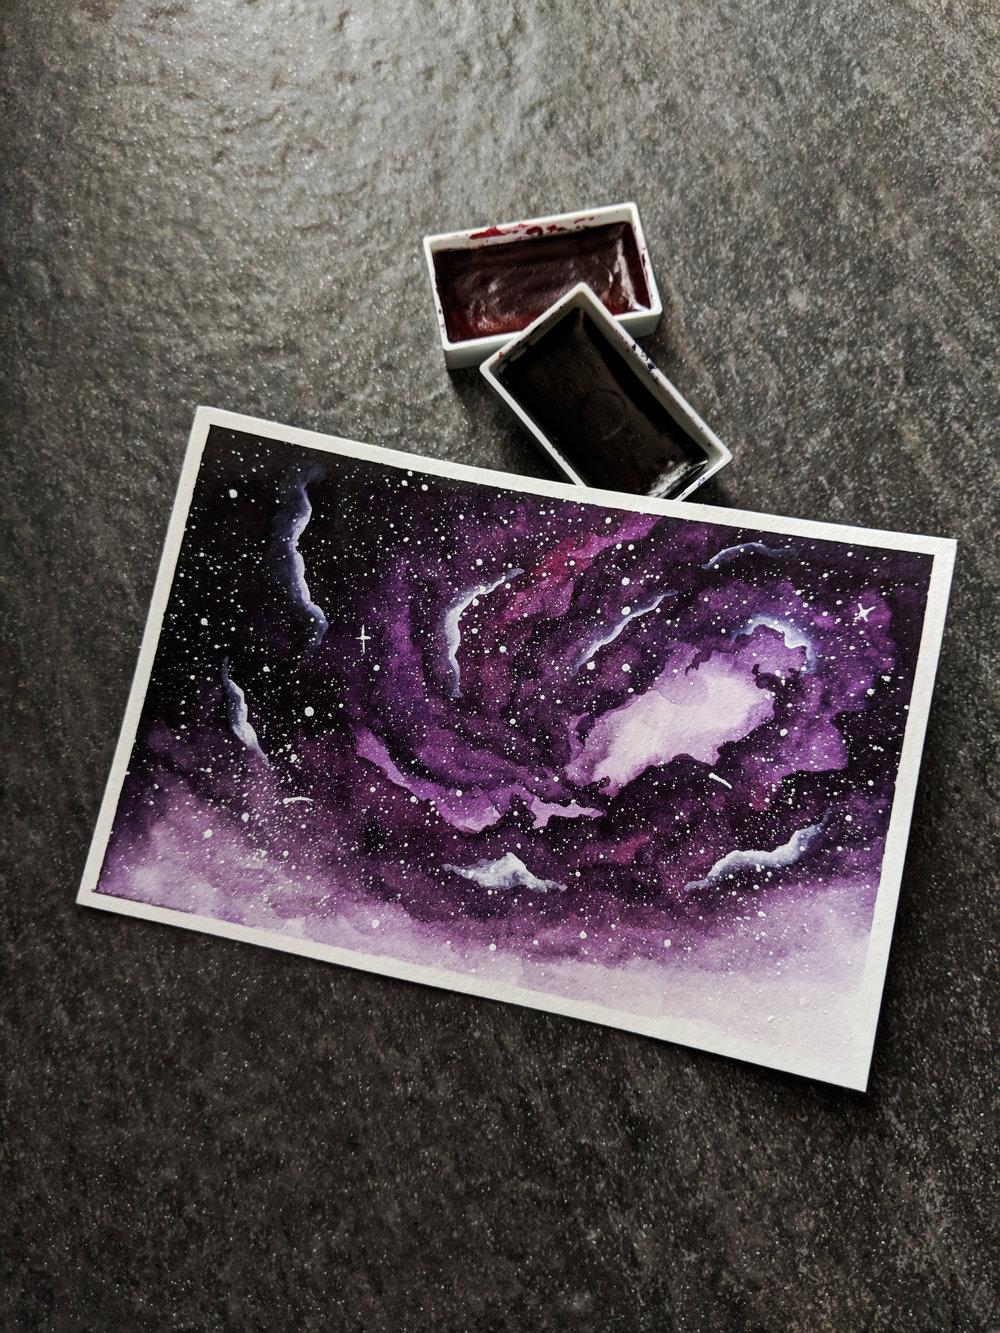 Purple Sprial Galaxy_Editing.jpg